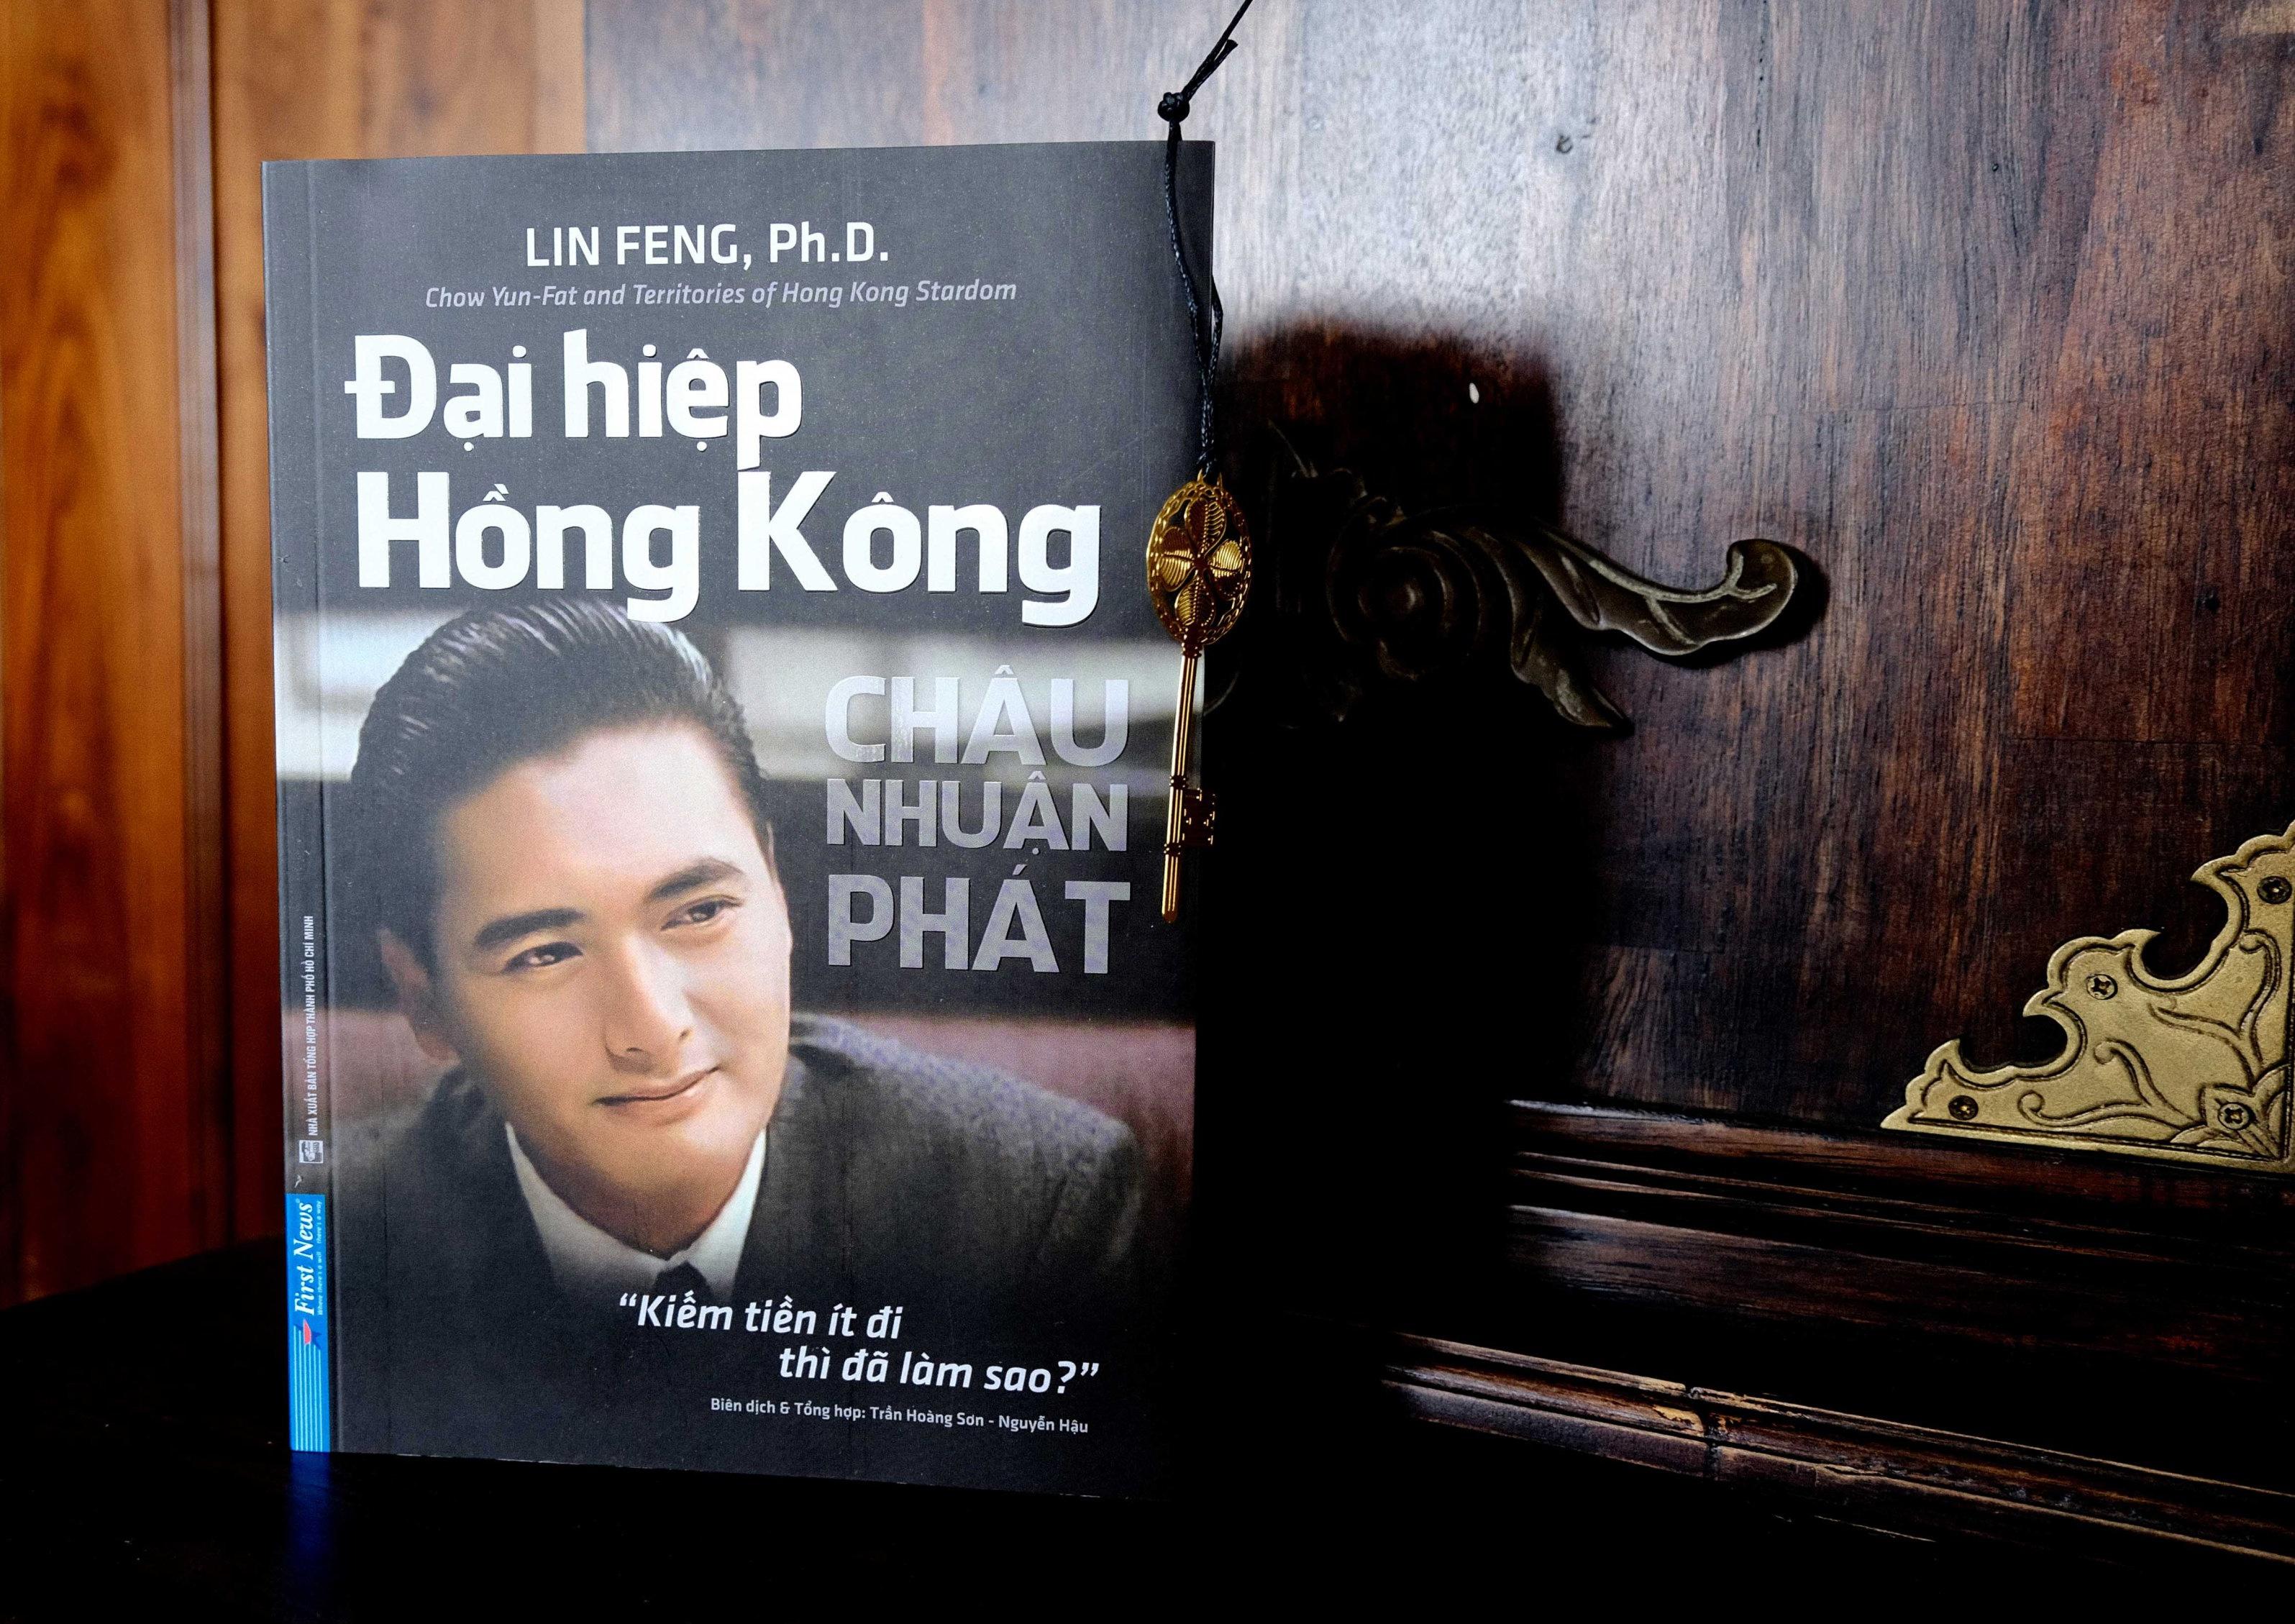 Chau Nhuan Phat anh 1